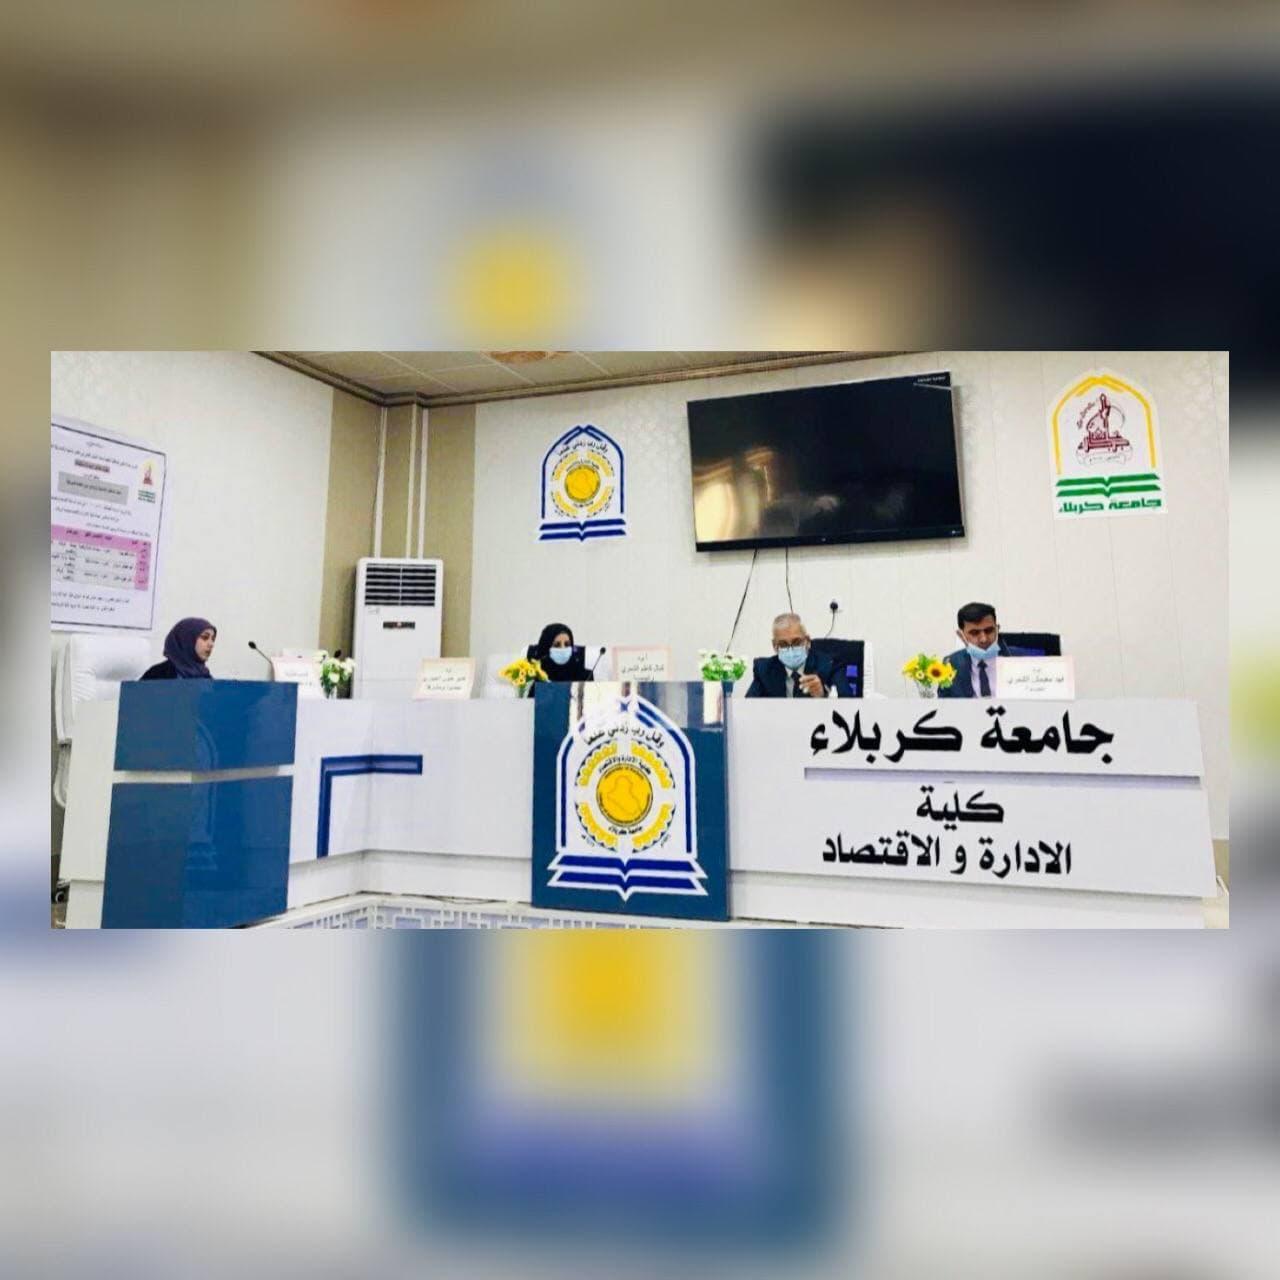 You are currently viewing جامعة كربلاء تناقش بحث في تحليل المخاطرة الائتمانية وأثرها في تعزيز الكفاءة المصرفية